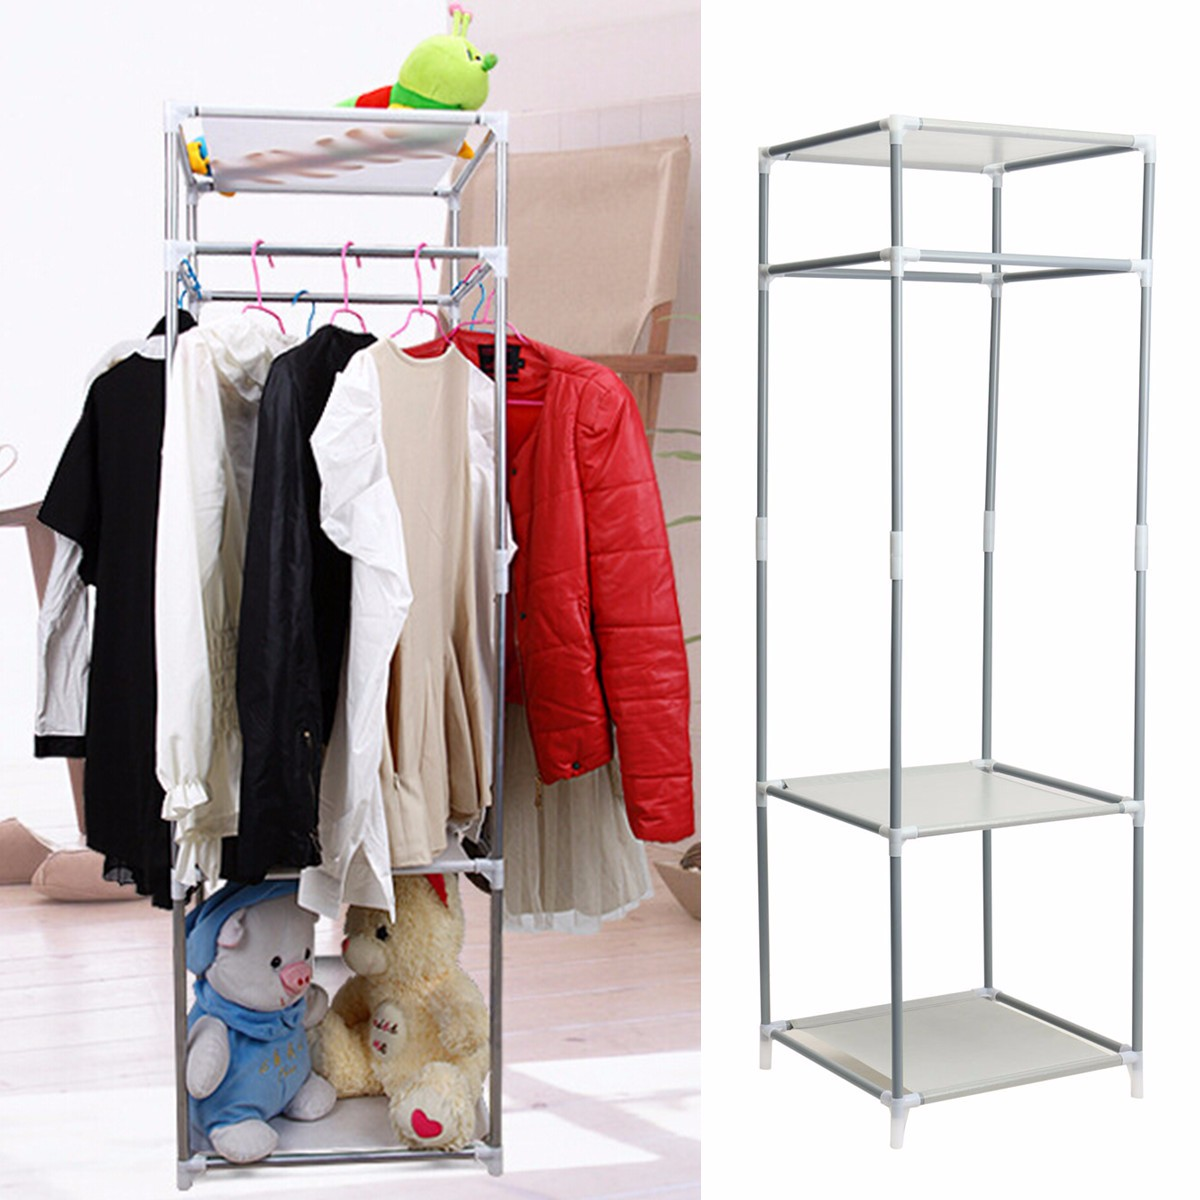 Design Diy Clothes Storage multifunctional oat metal closet storage organizers wardrobe clothes rack hanger home diy sundies shelves in wardrobes from furniture